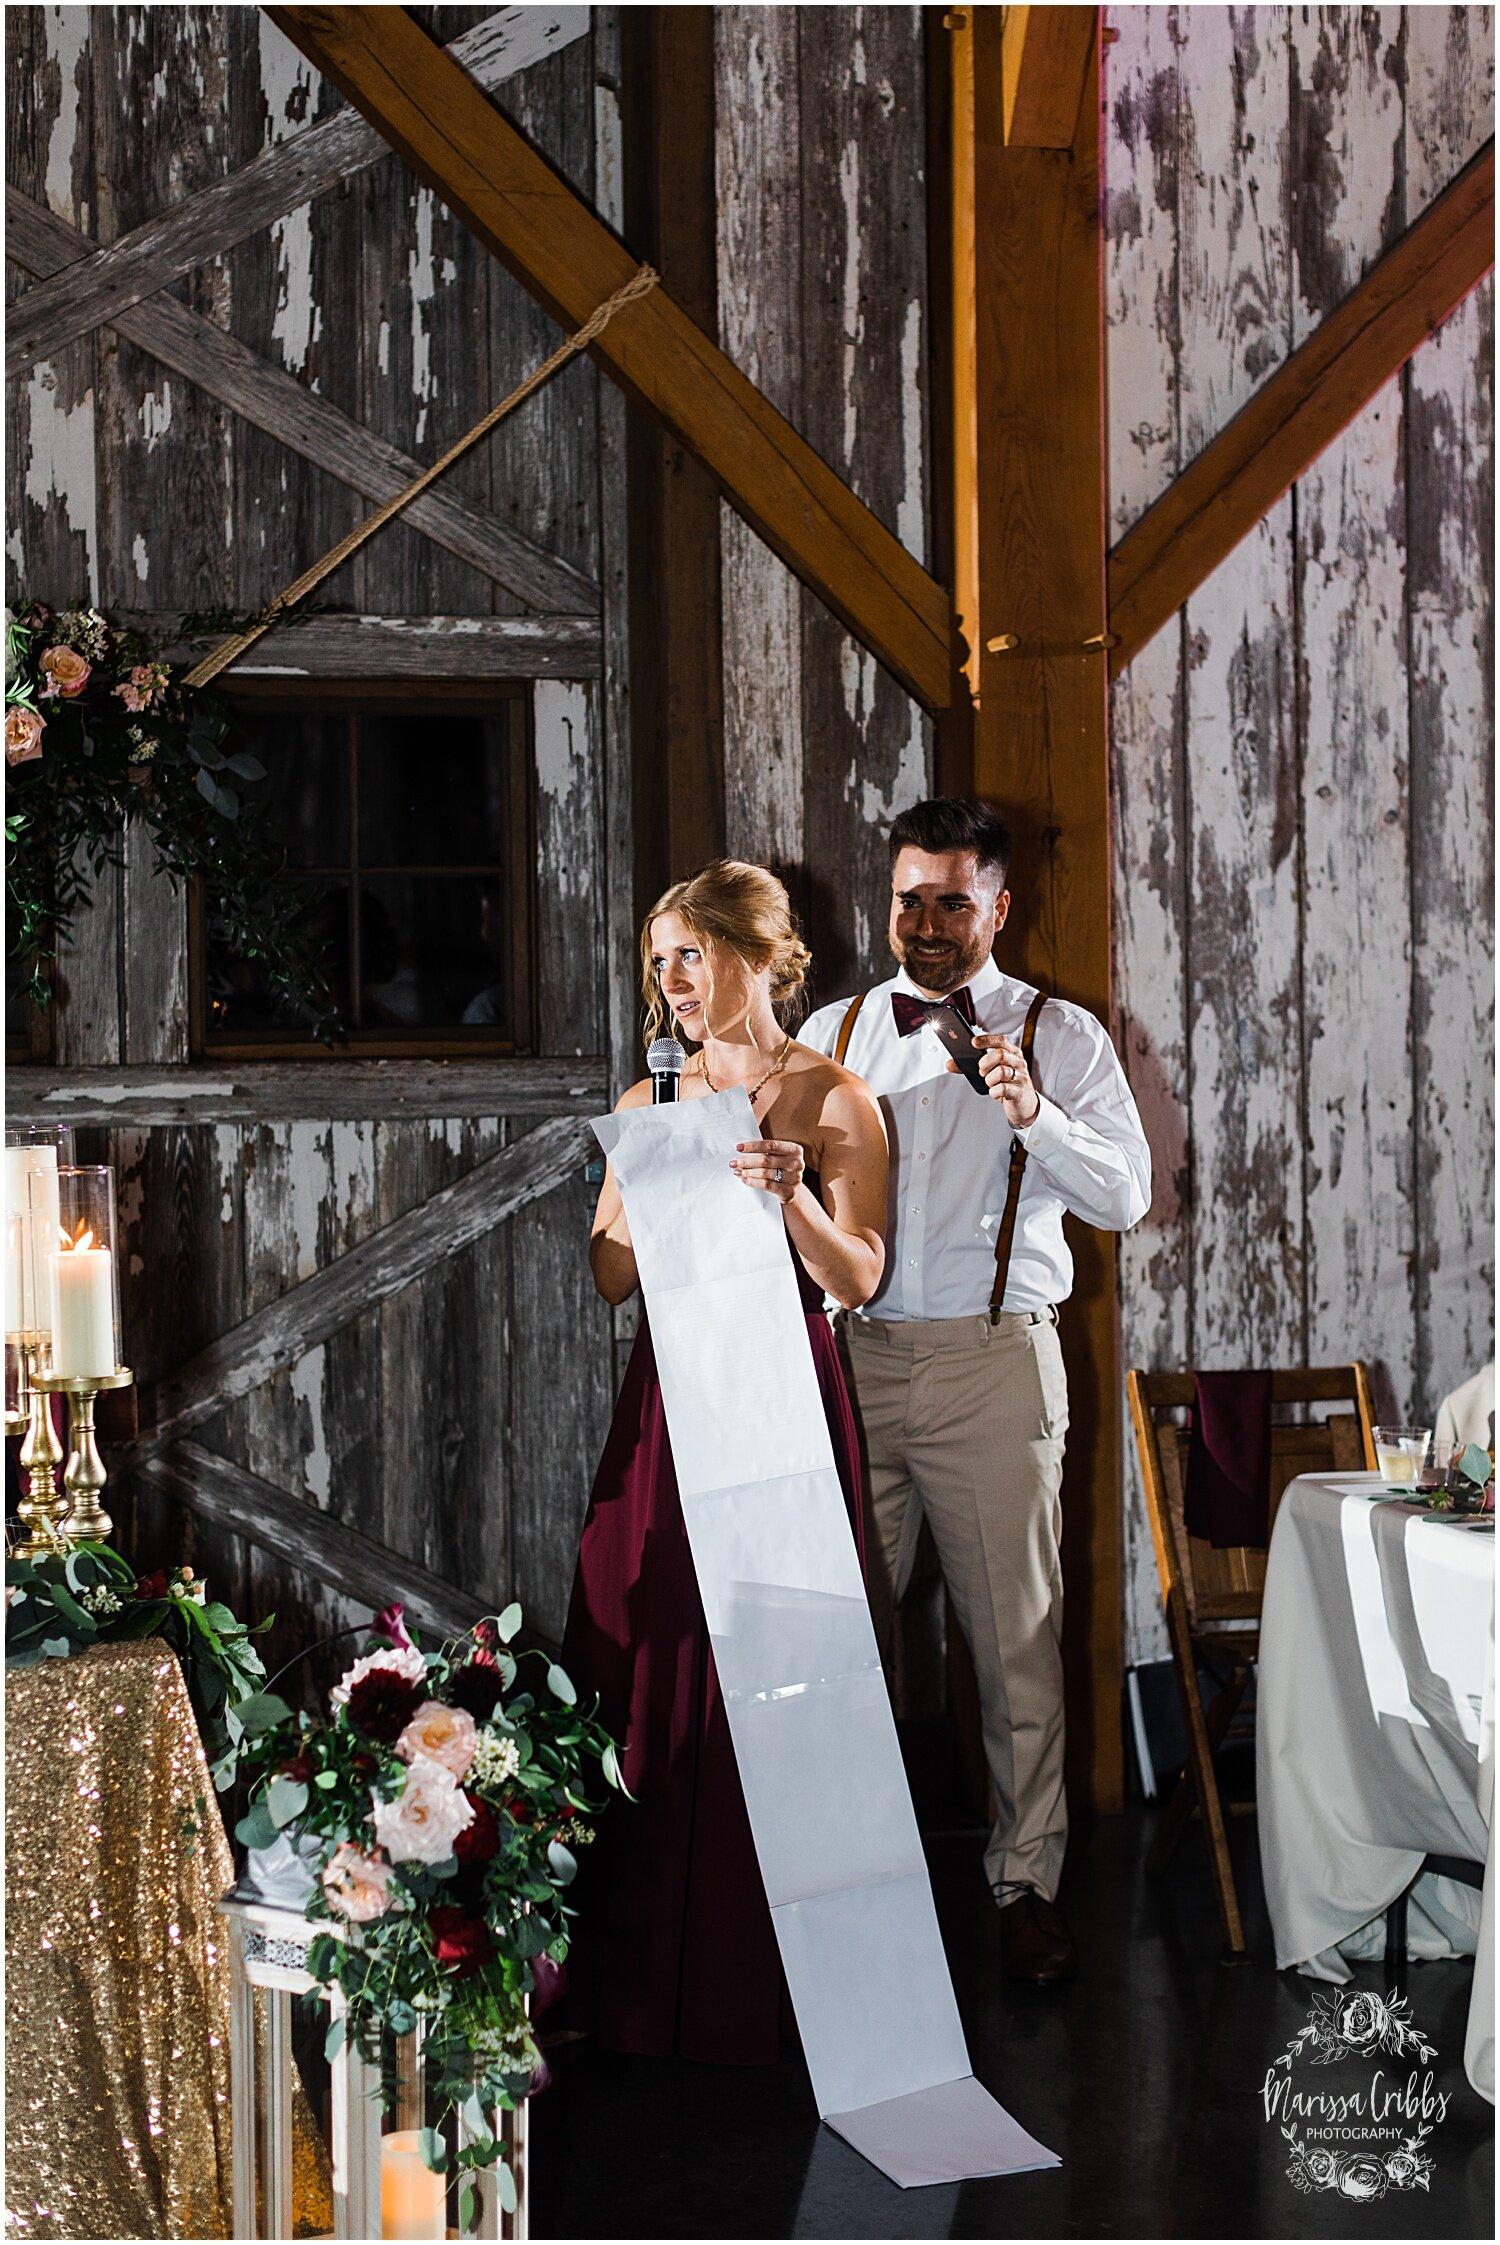 ANNA & LUKE MARRIED BLOG | MARISSA CRIBBS PHOTOGRAPHY | WESTON RED BARN FARM_9465.jpg